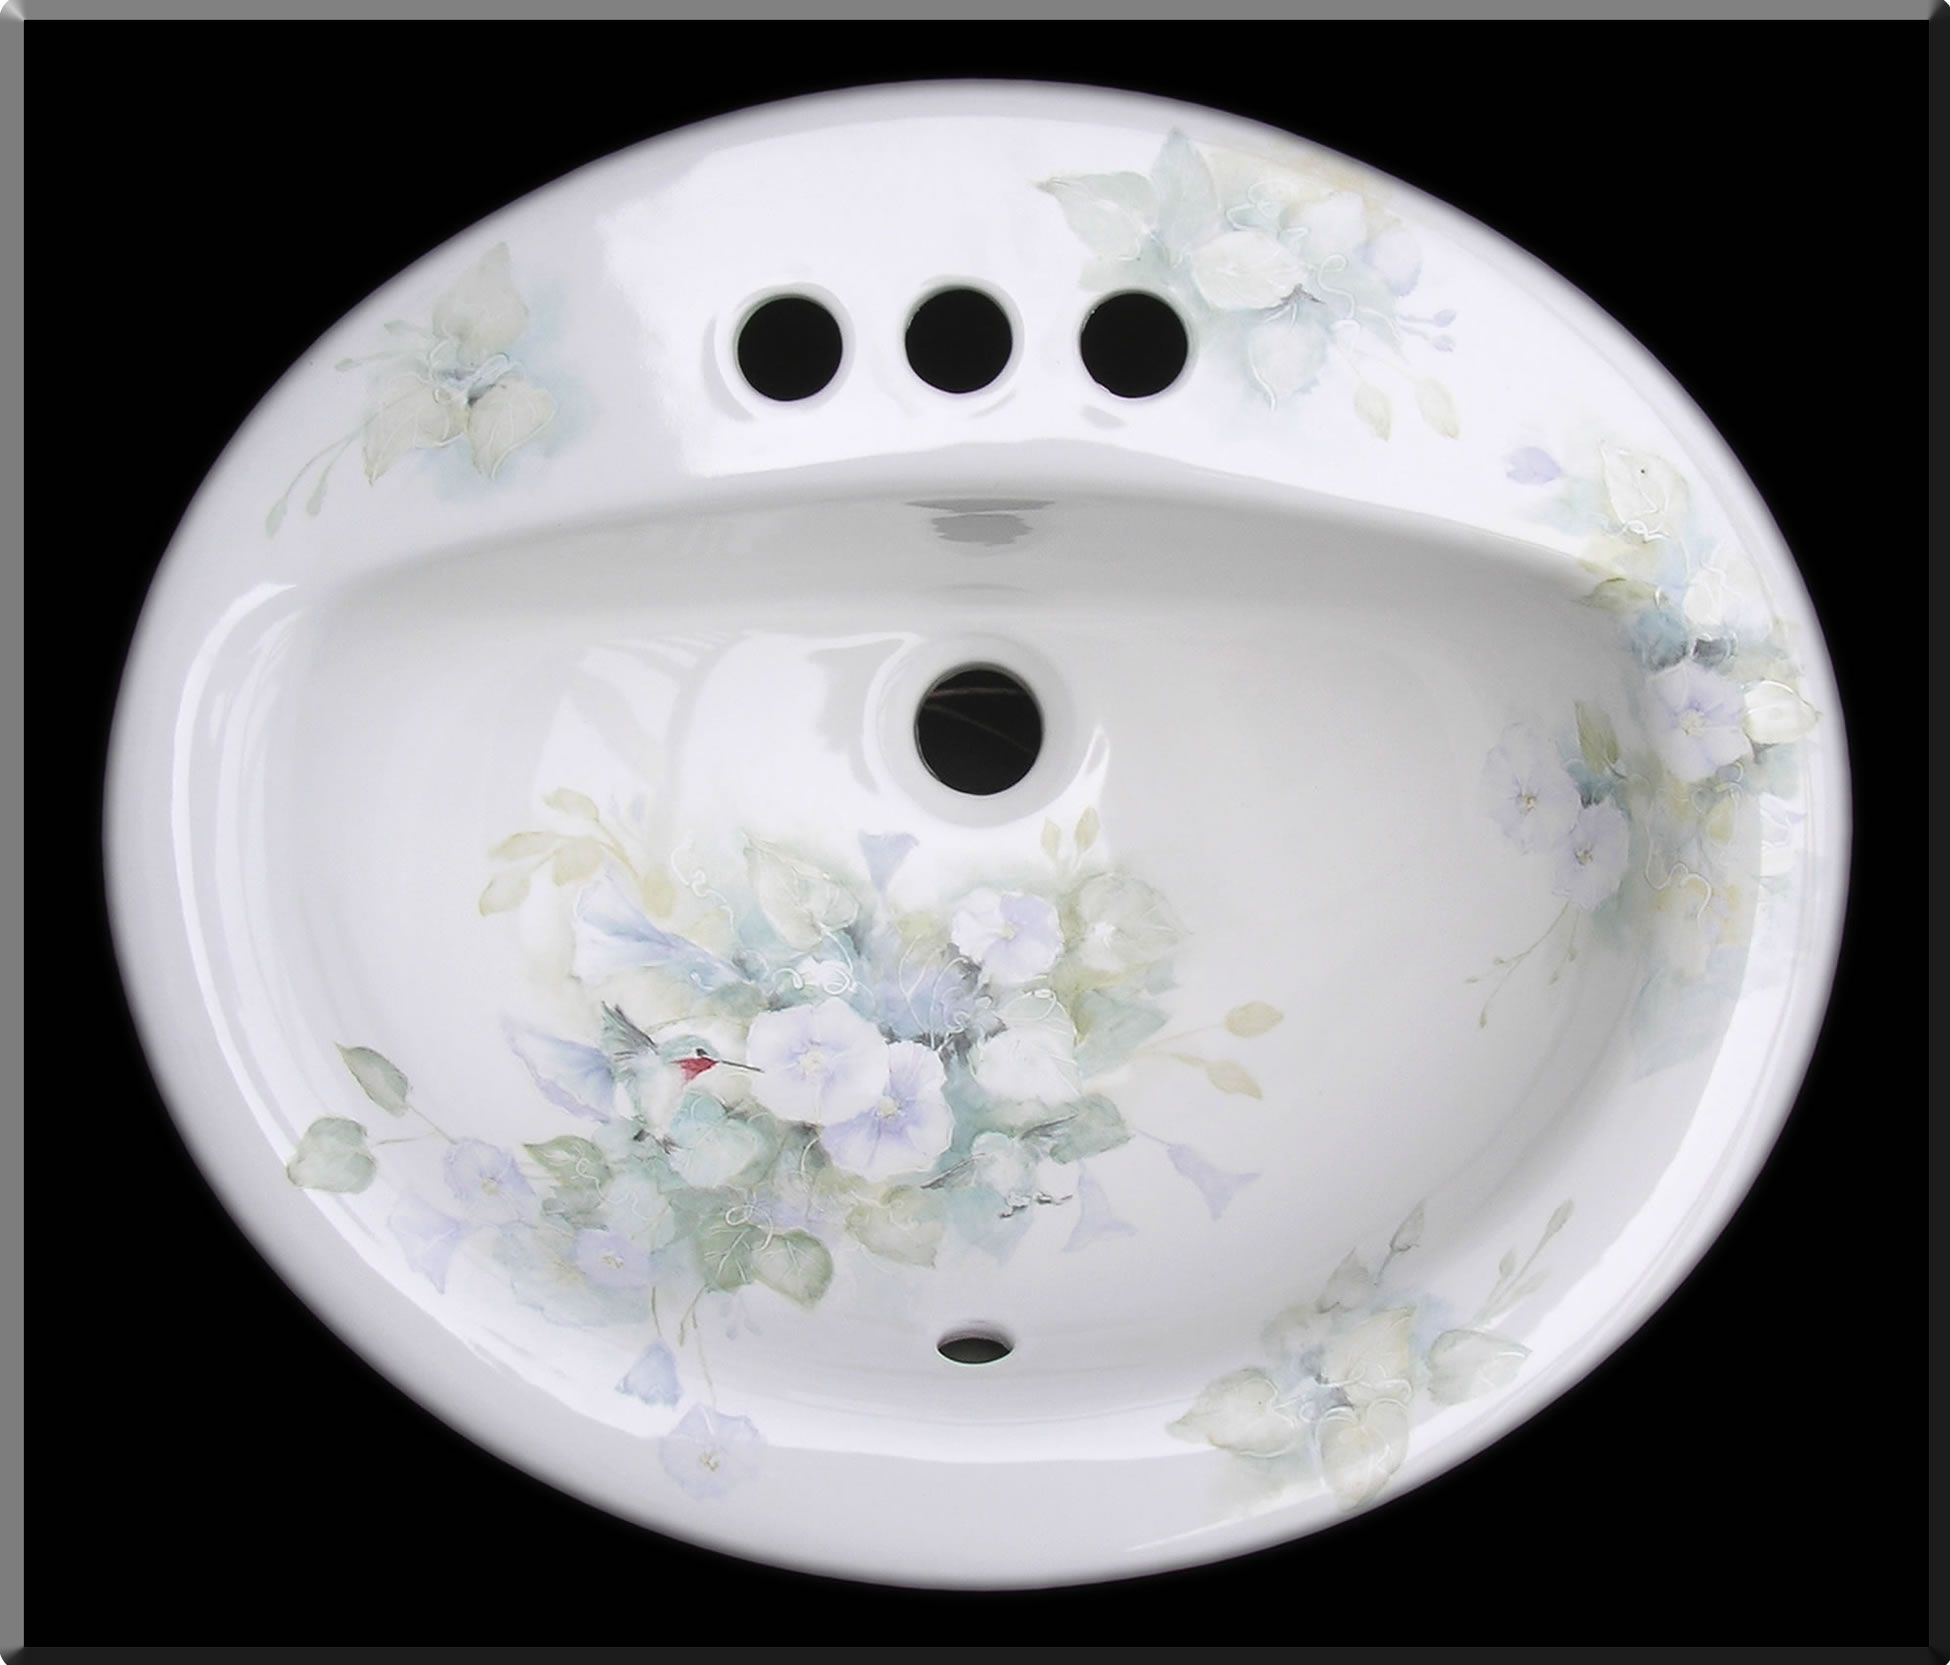 Hand Painted Bathroom Sinks Bathroom Sink Bathroom